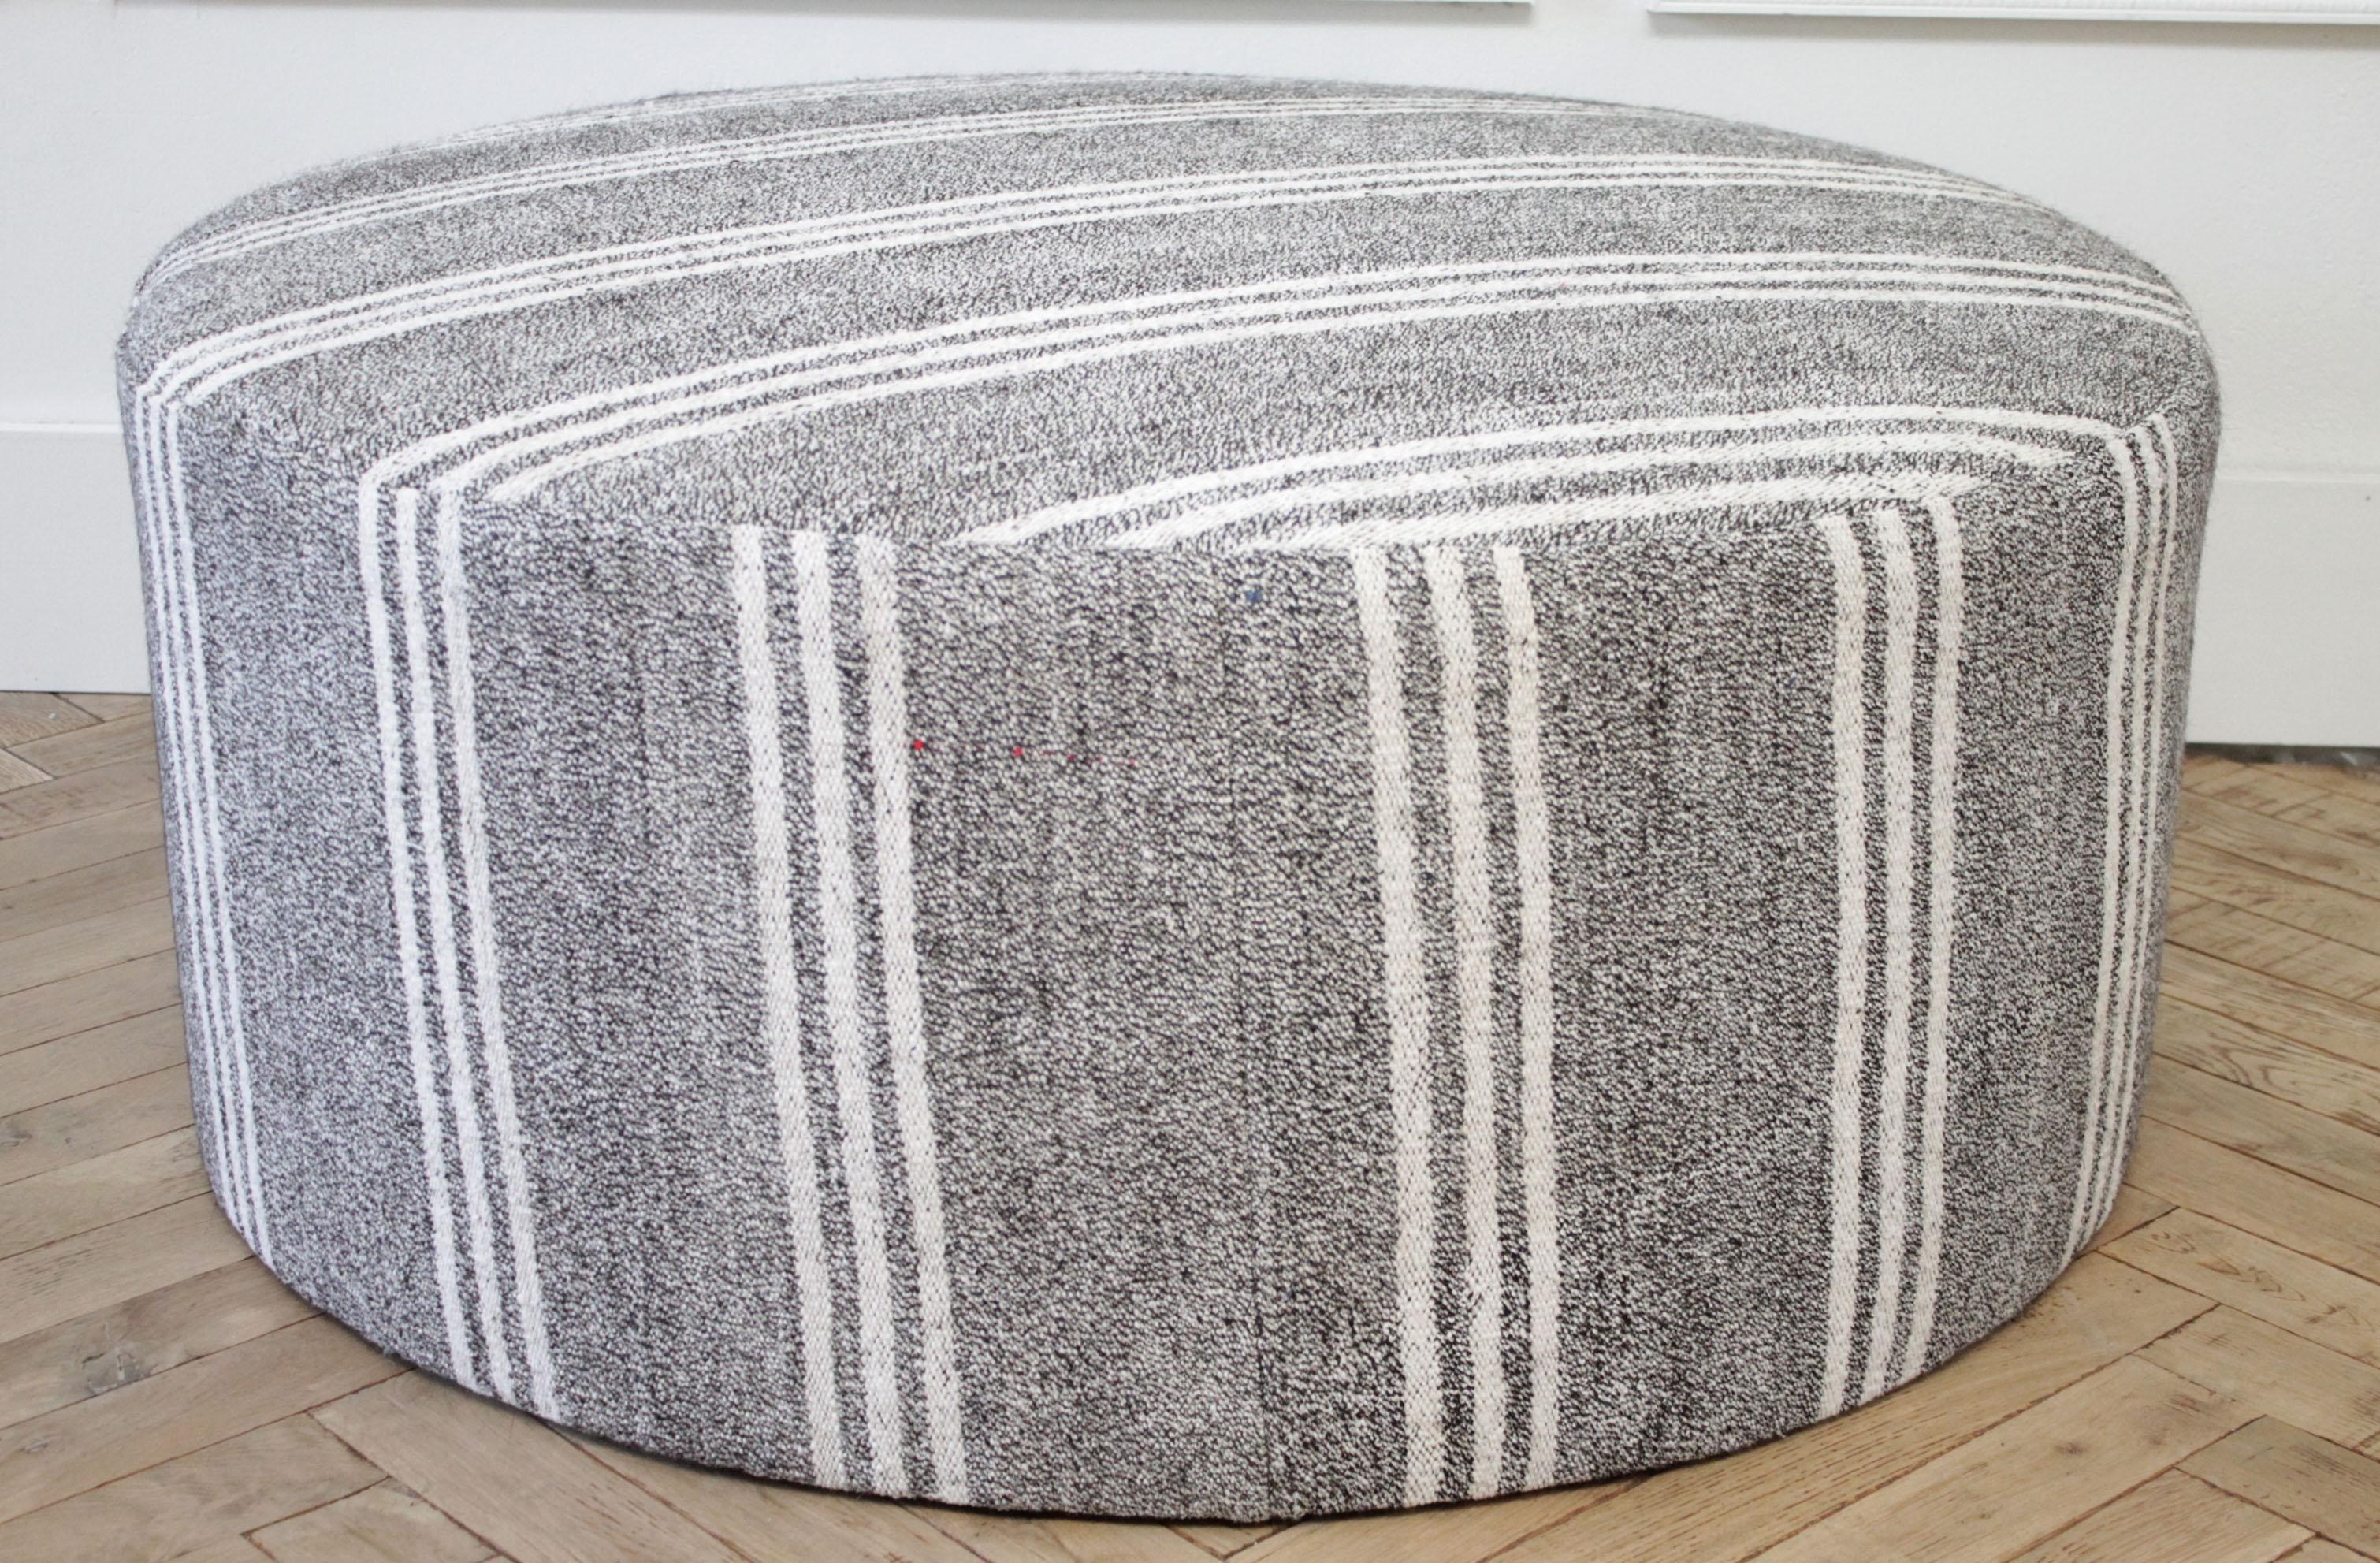 custom made vintage turkish rug round cocktail ottoman coffee table